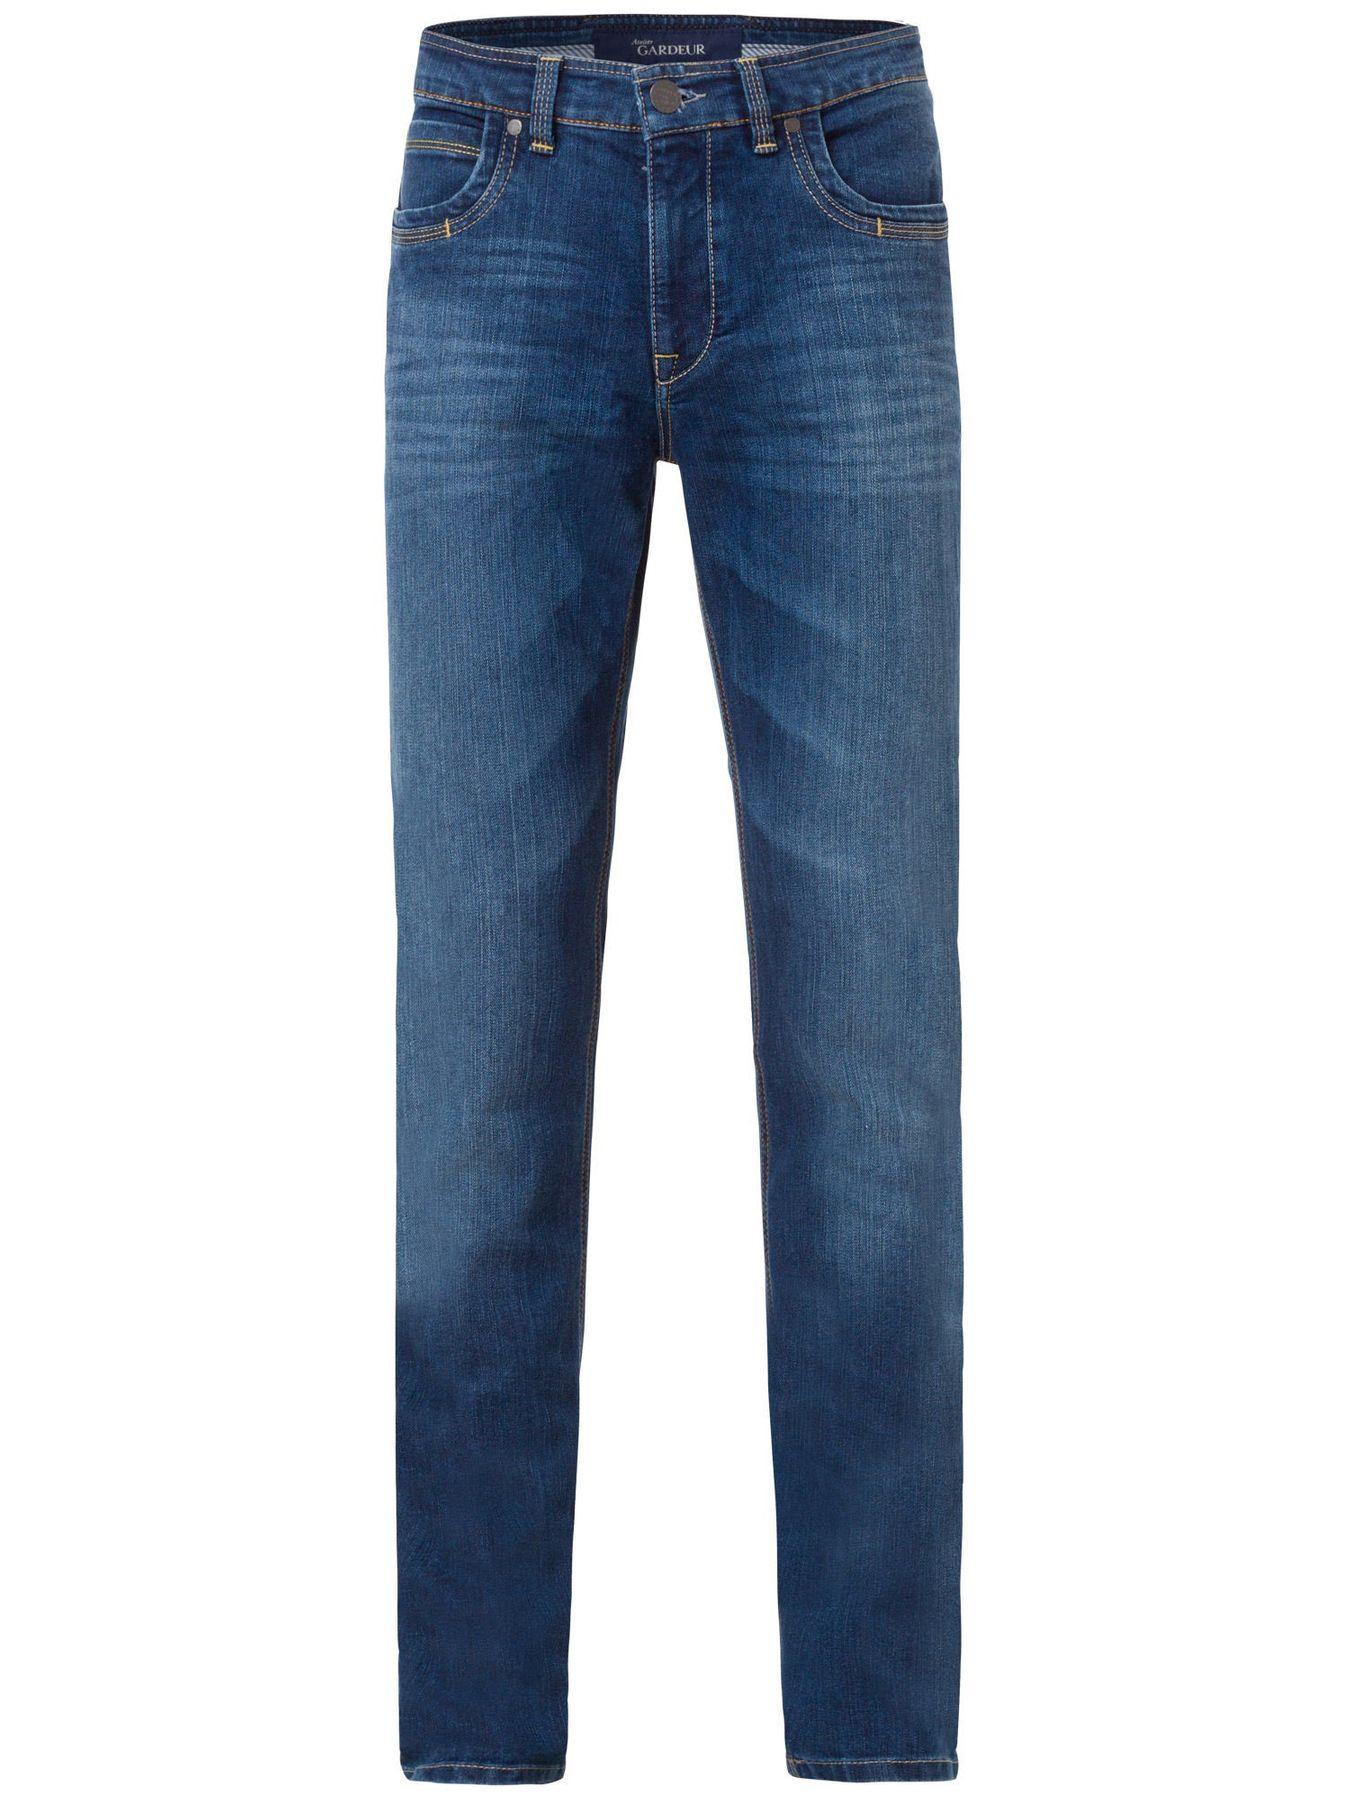 Atelier Gardeur - Herren 5-Pocket Jeans Superflex, Farben black(99), dark stone(68), stone blue(67), anthrazit(198) BATU (71001) – Bild 1